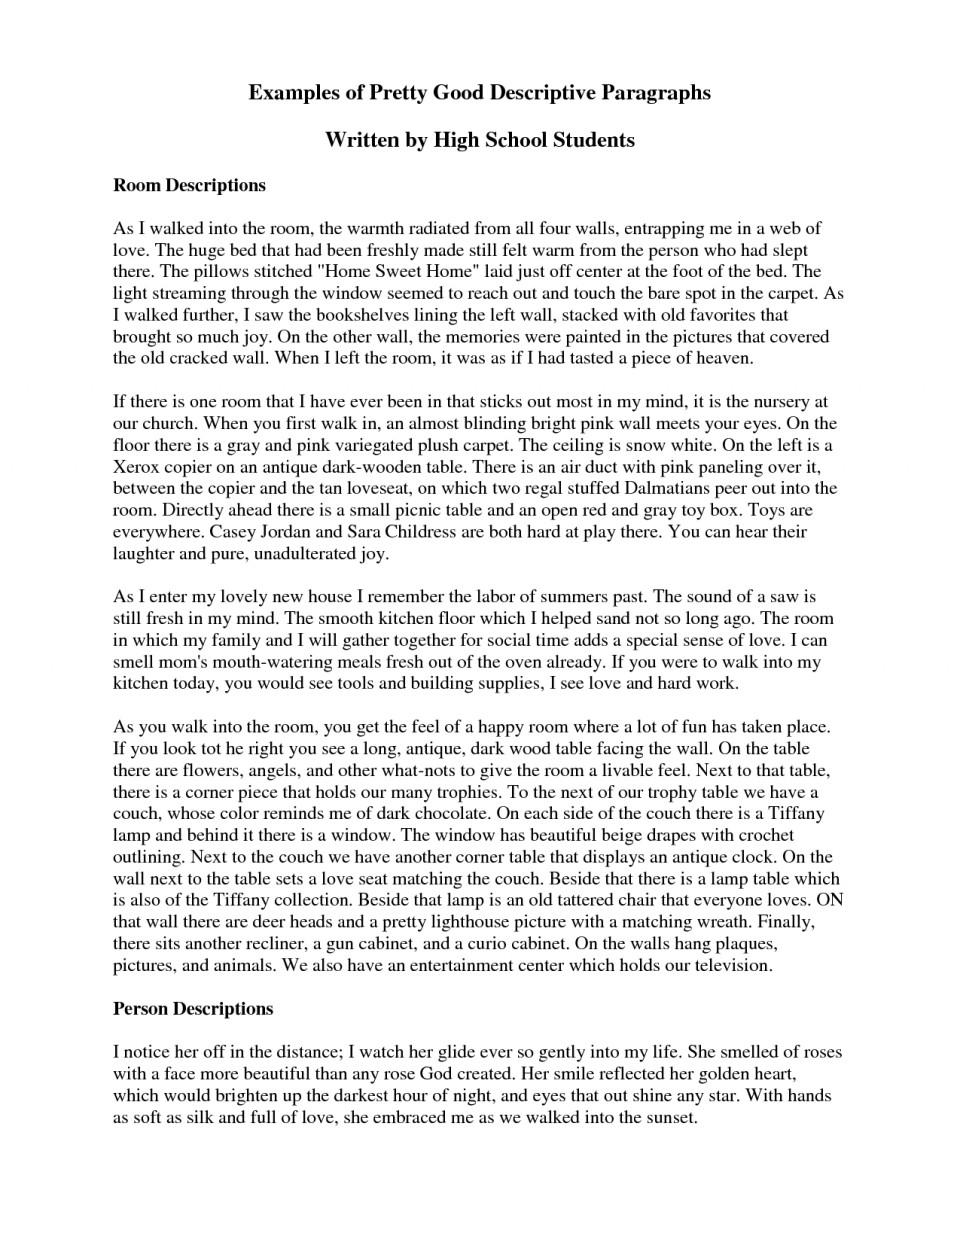 021 Descriptive Essayss Short Paragraph Essay Amazing Essays Examples Sample About A Person Pdf Free Spm 960